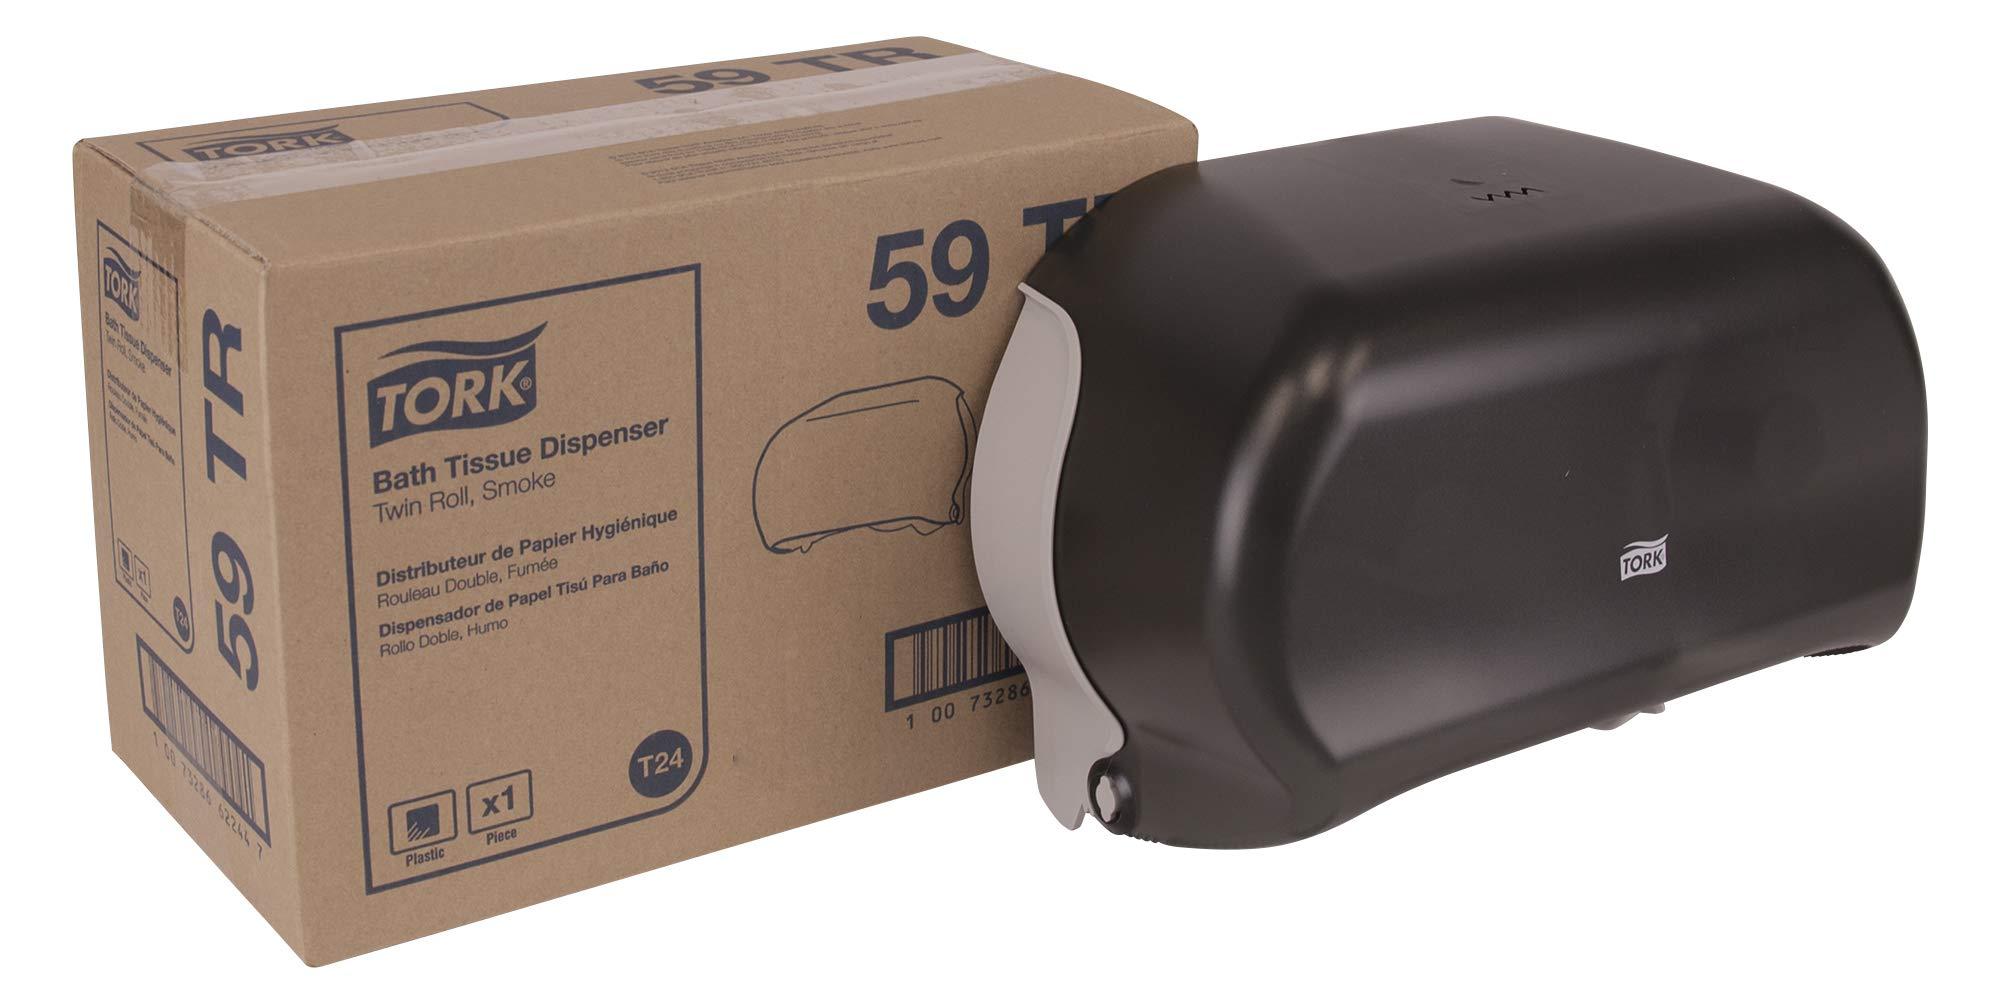 "Tork 59TR Twin Bath Tissue Roll Dispenser, Plastic, 8.25"" Height x 12.75"" Width x 5.57"" Depth, Smoke (Case of 1) for use with Tork TM6511S, TM6512, TM6120S, TM6130S, TM1602"